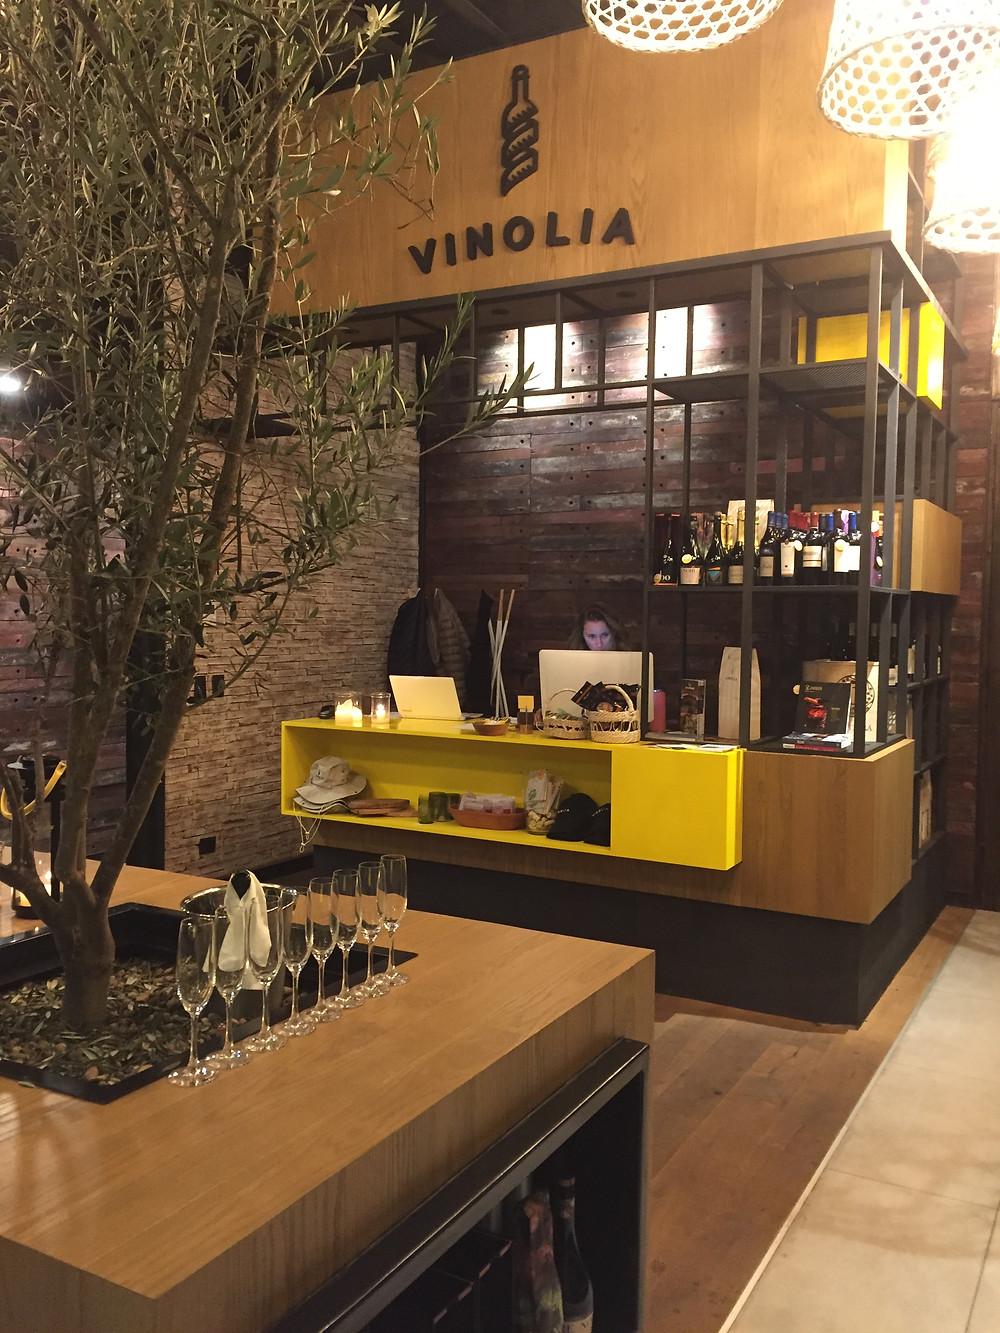 Vinolia Wine Experience